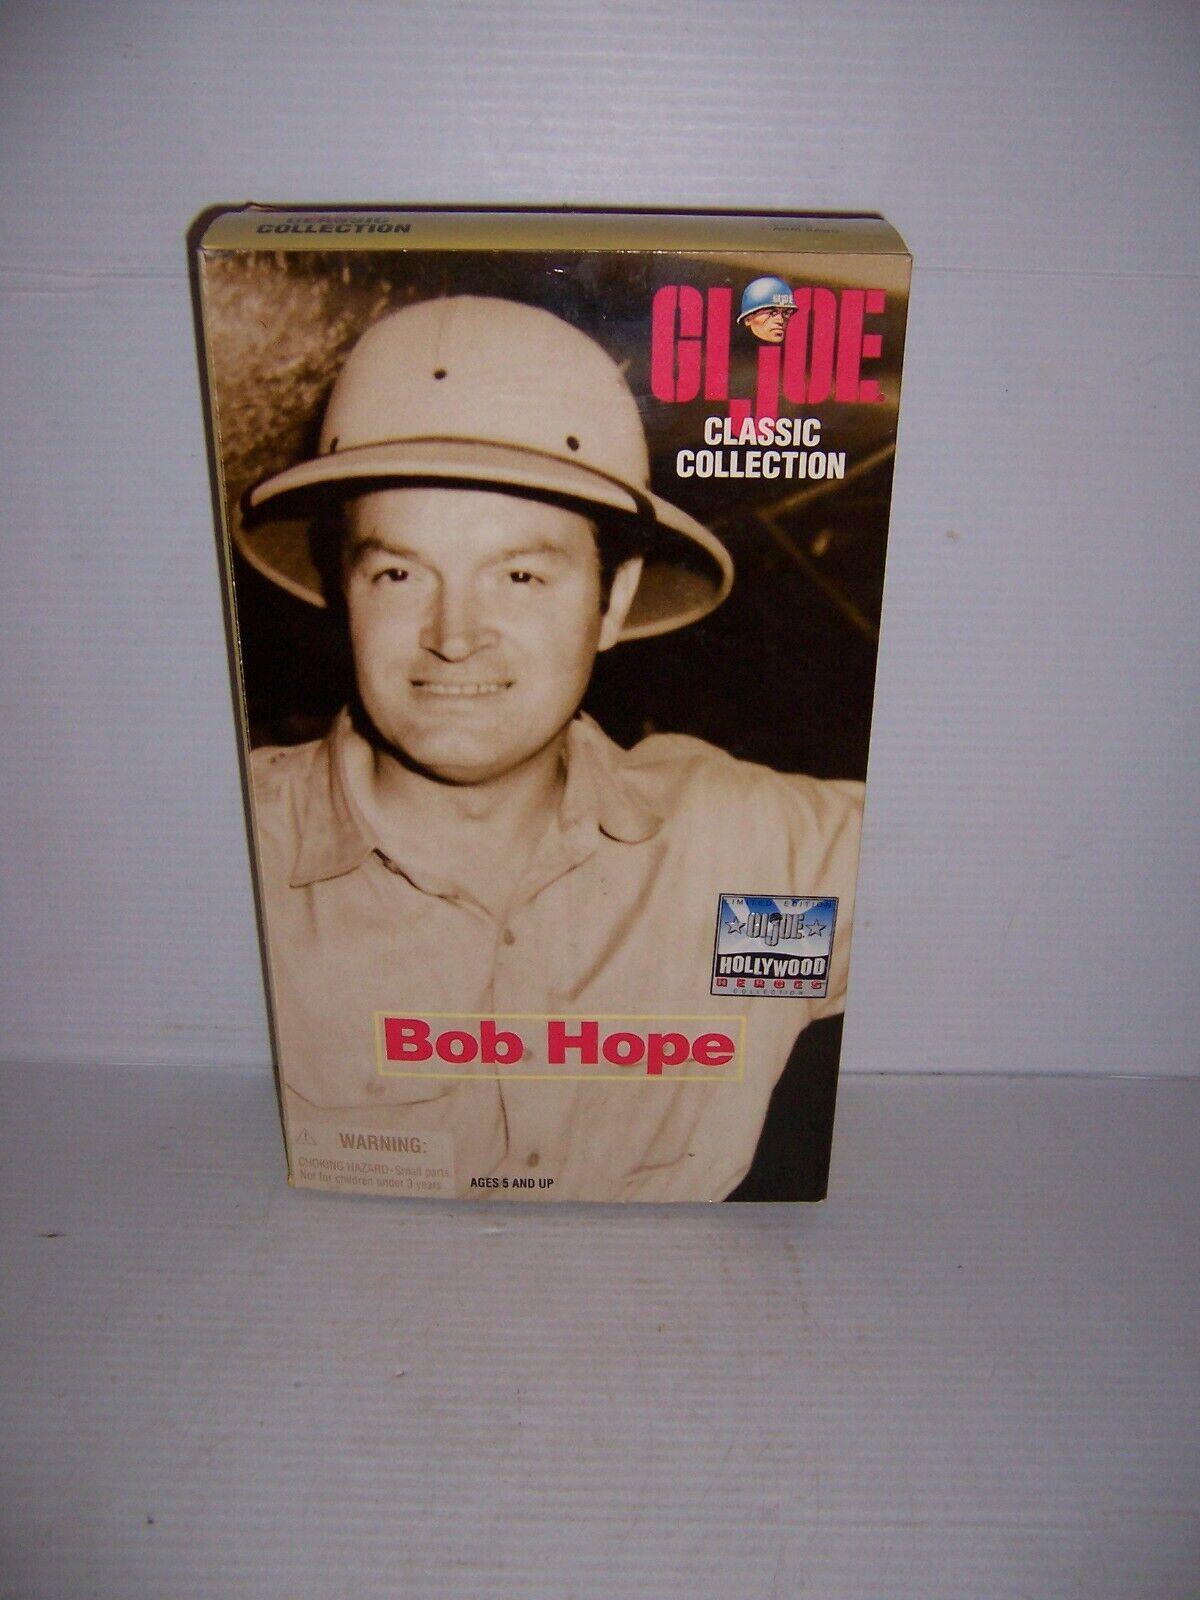 1998 GI Joe Classic Collection Hollywood Heroes 12  Bob Hope Action Figure MIB